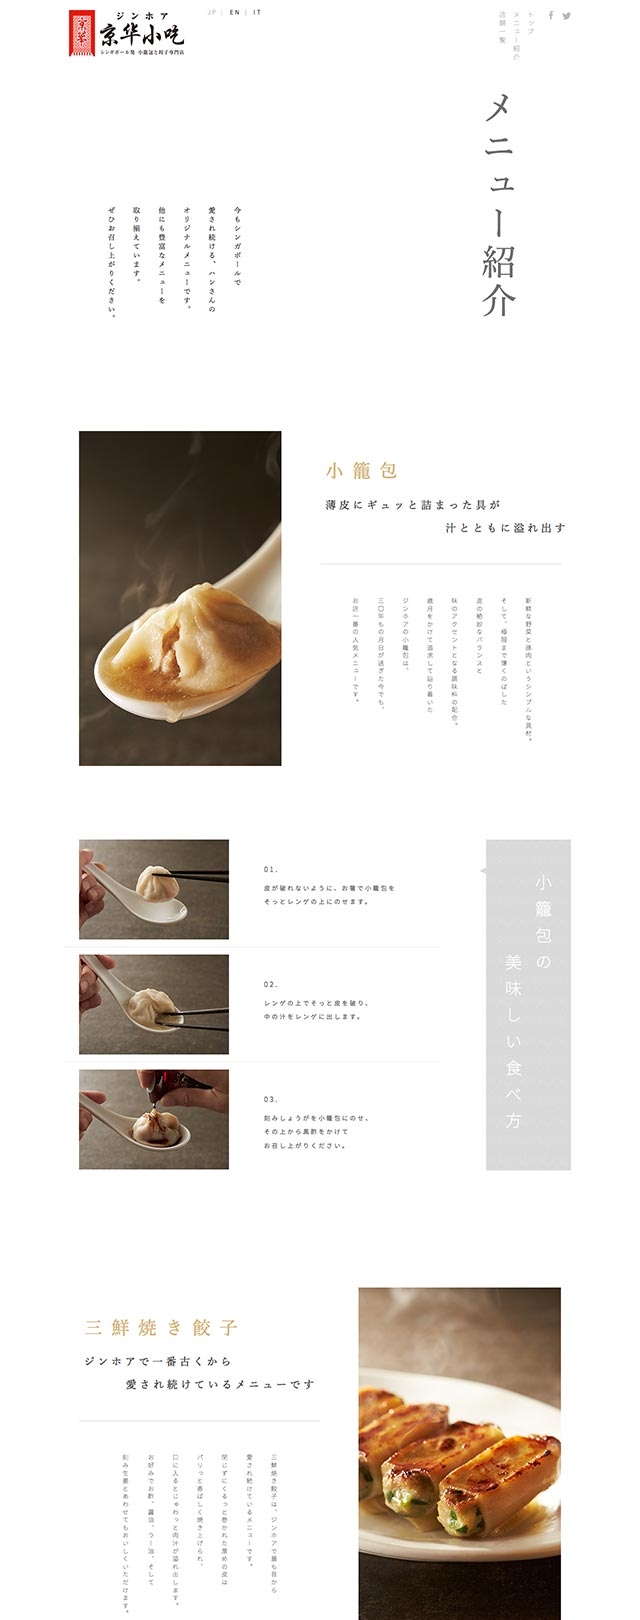 Jing Hua image